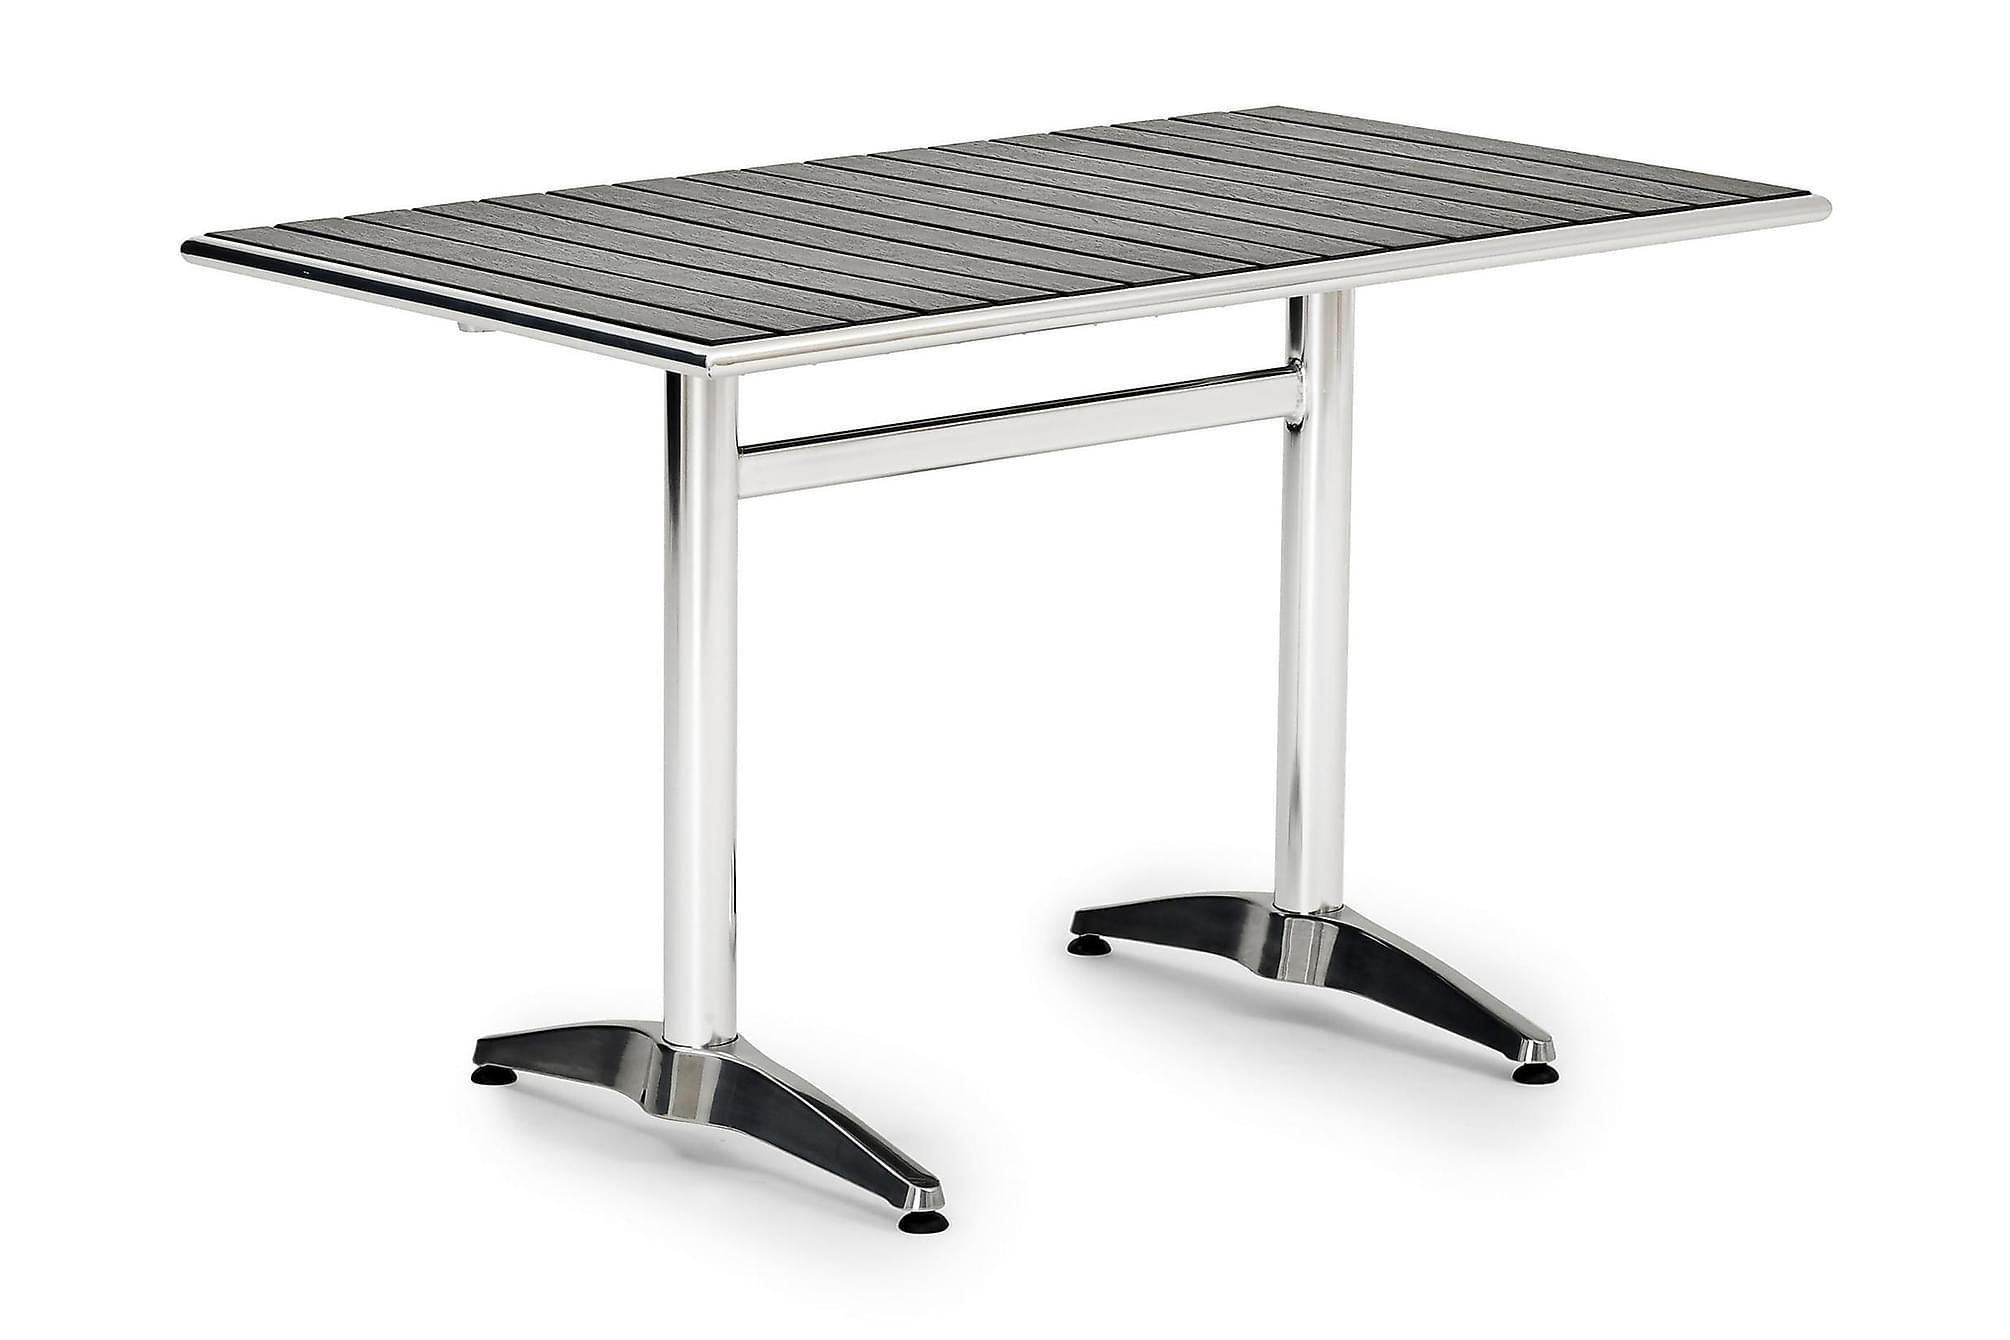 ALUNDA Bord 70x120 Aluminium, Cafebord